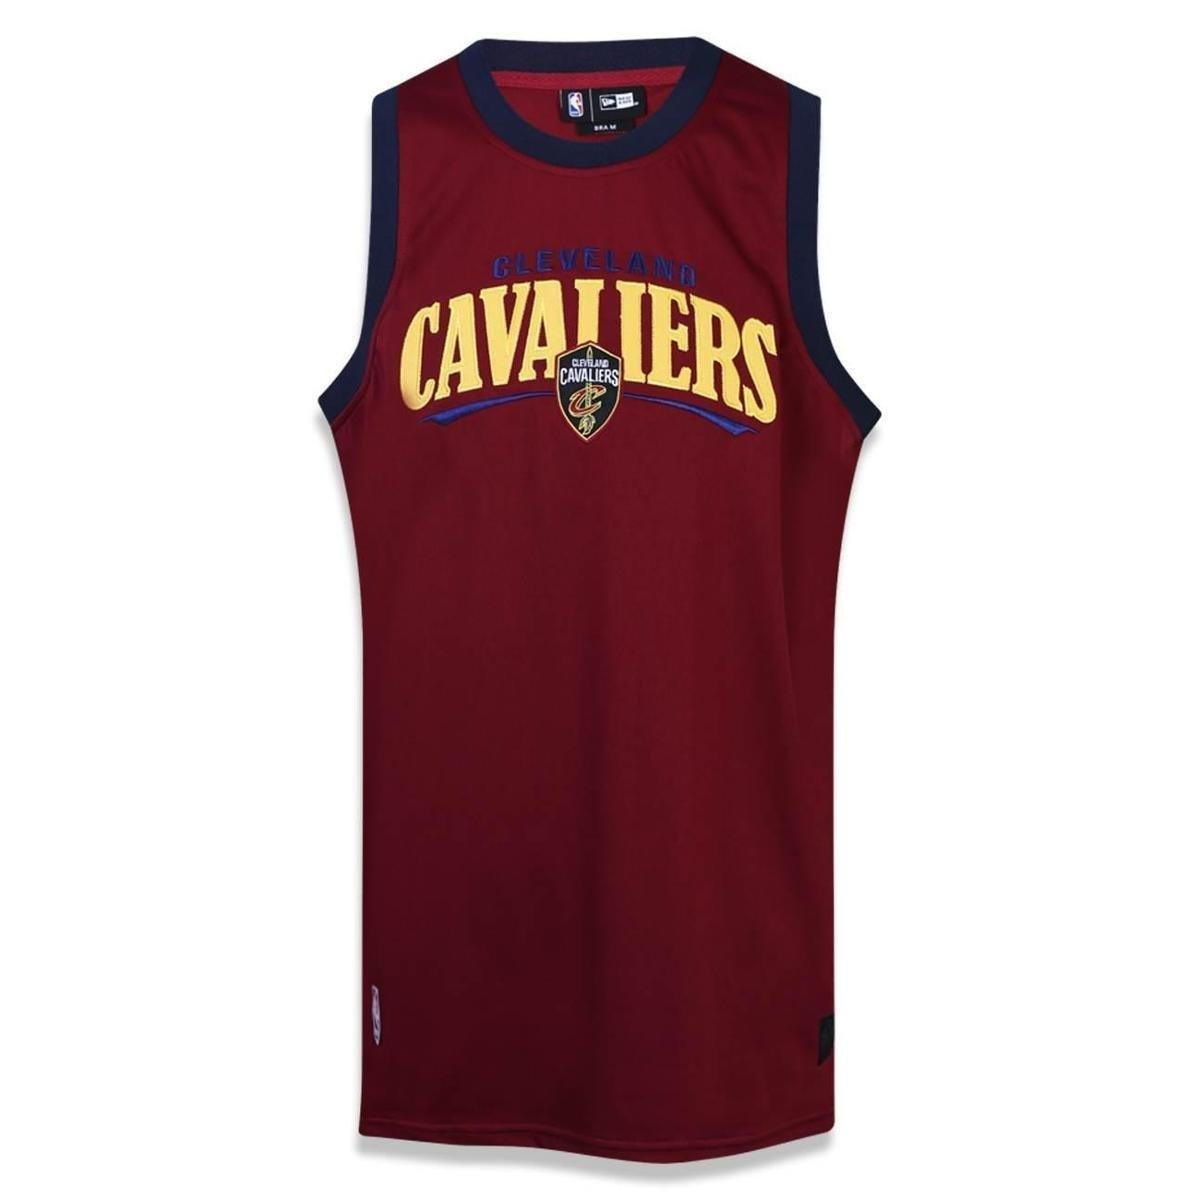 Regata Cleveland Cavaliers NBA New Era Masculino - Vinho - Compre Agora  b3dfc67c4fc